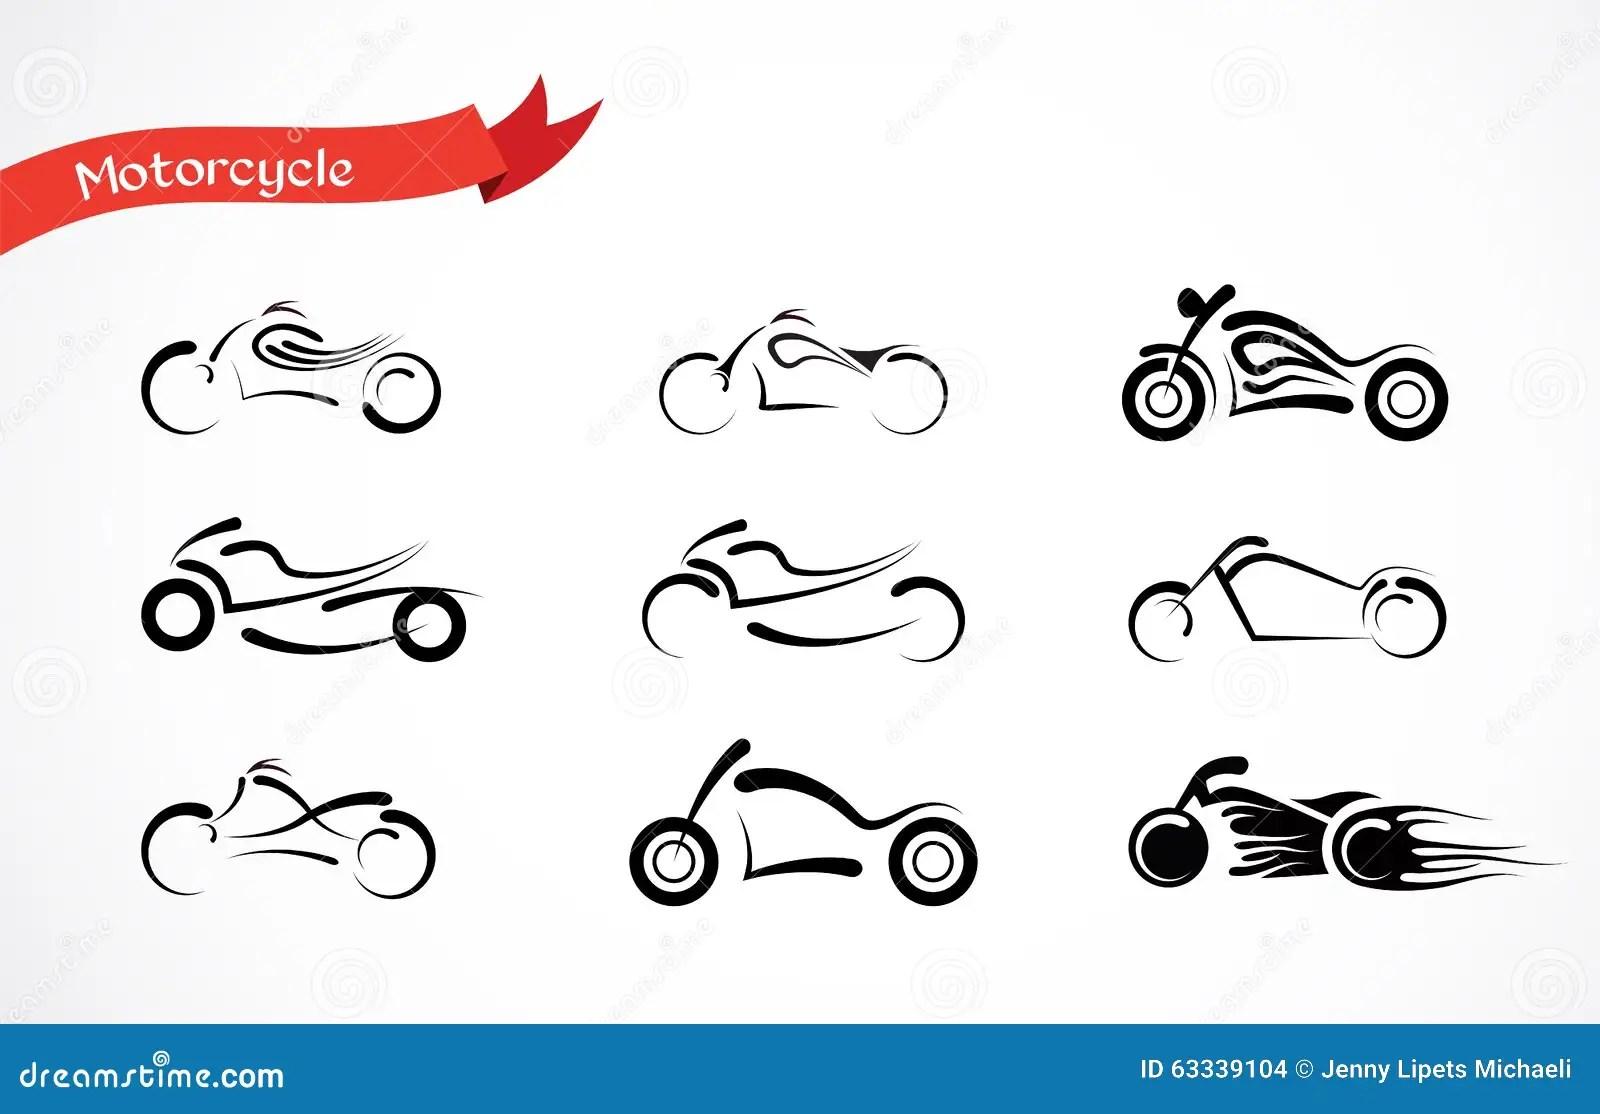 Classic Motorcycle Logo Vector Illustration